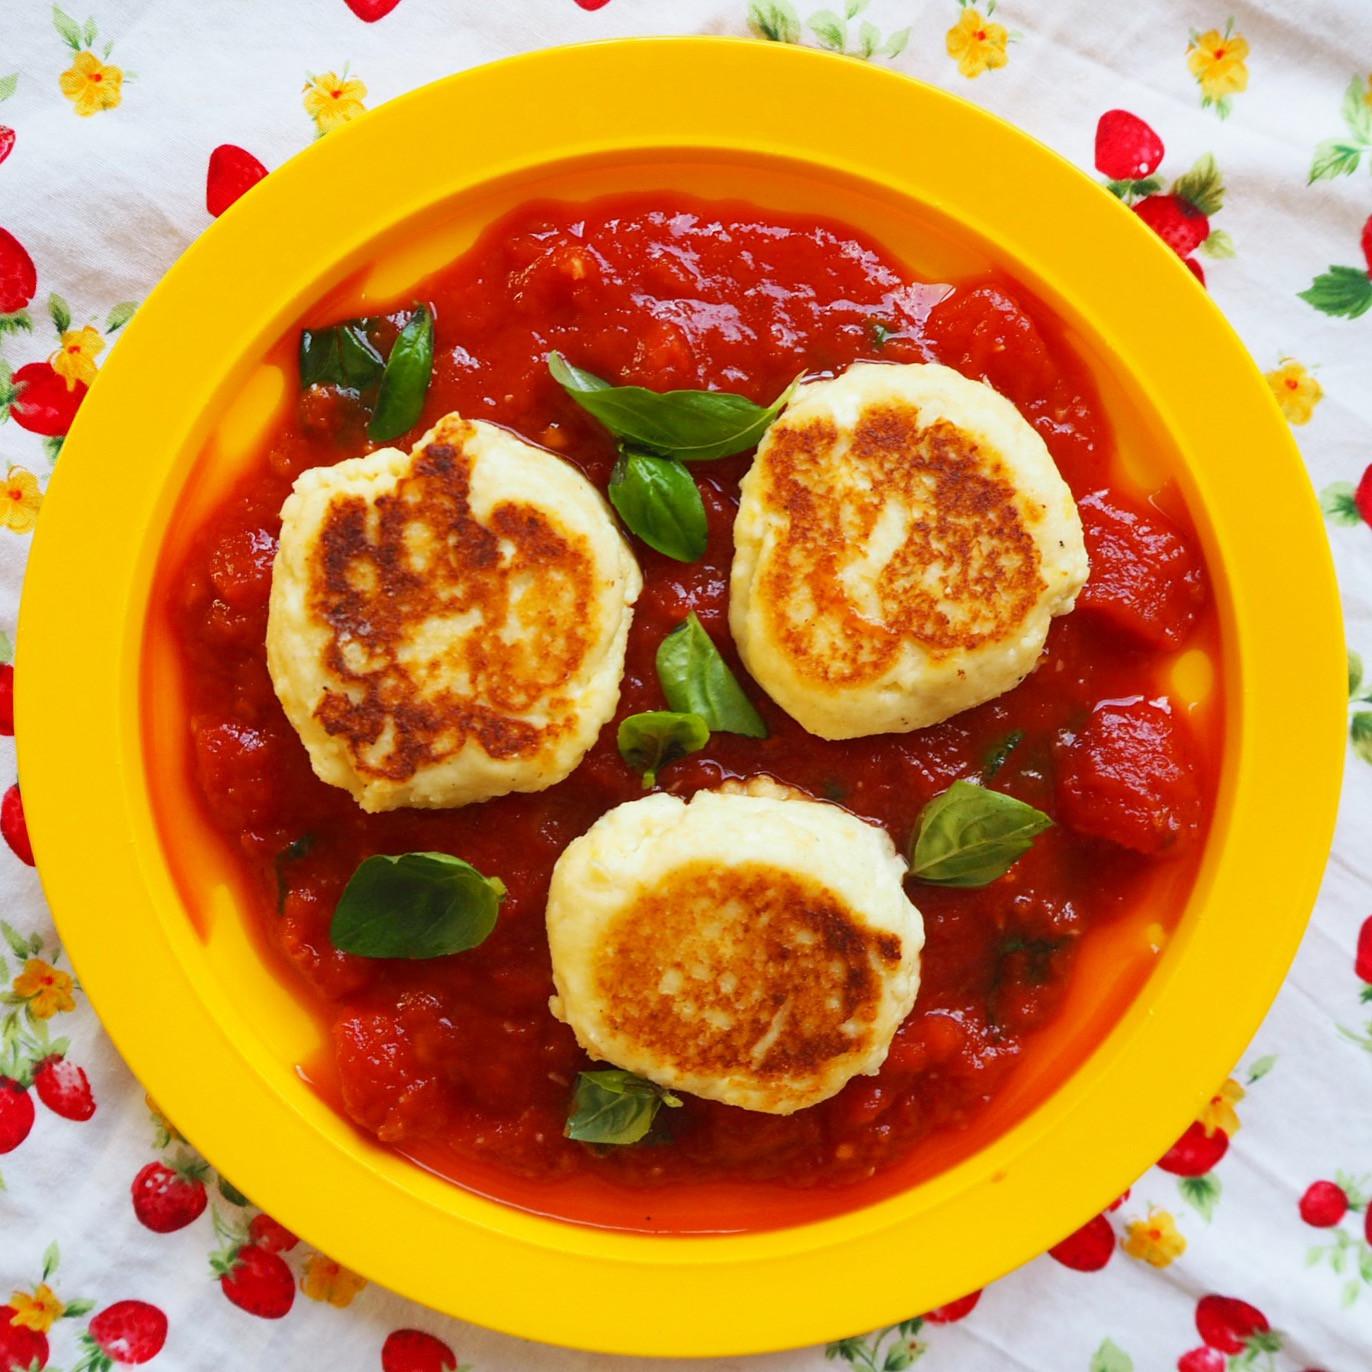 Tomato Basil Sauce  ricotta fritters w' tomato basil sauce